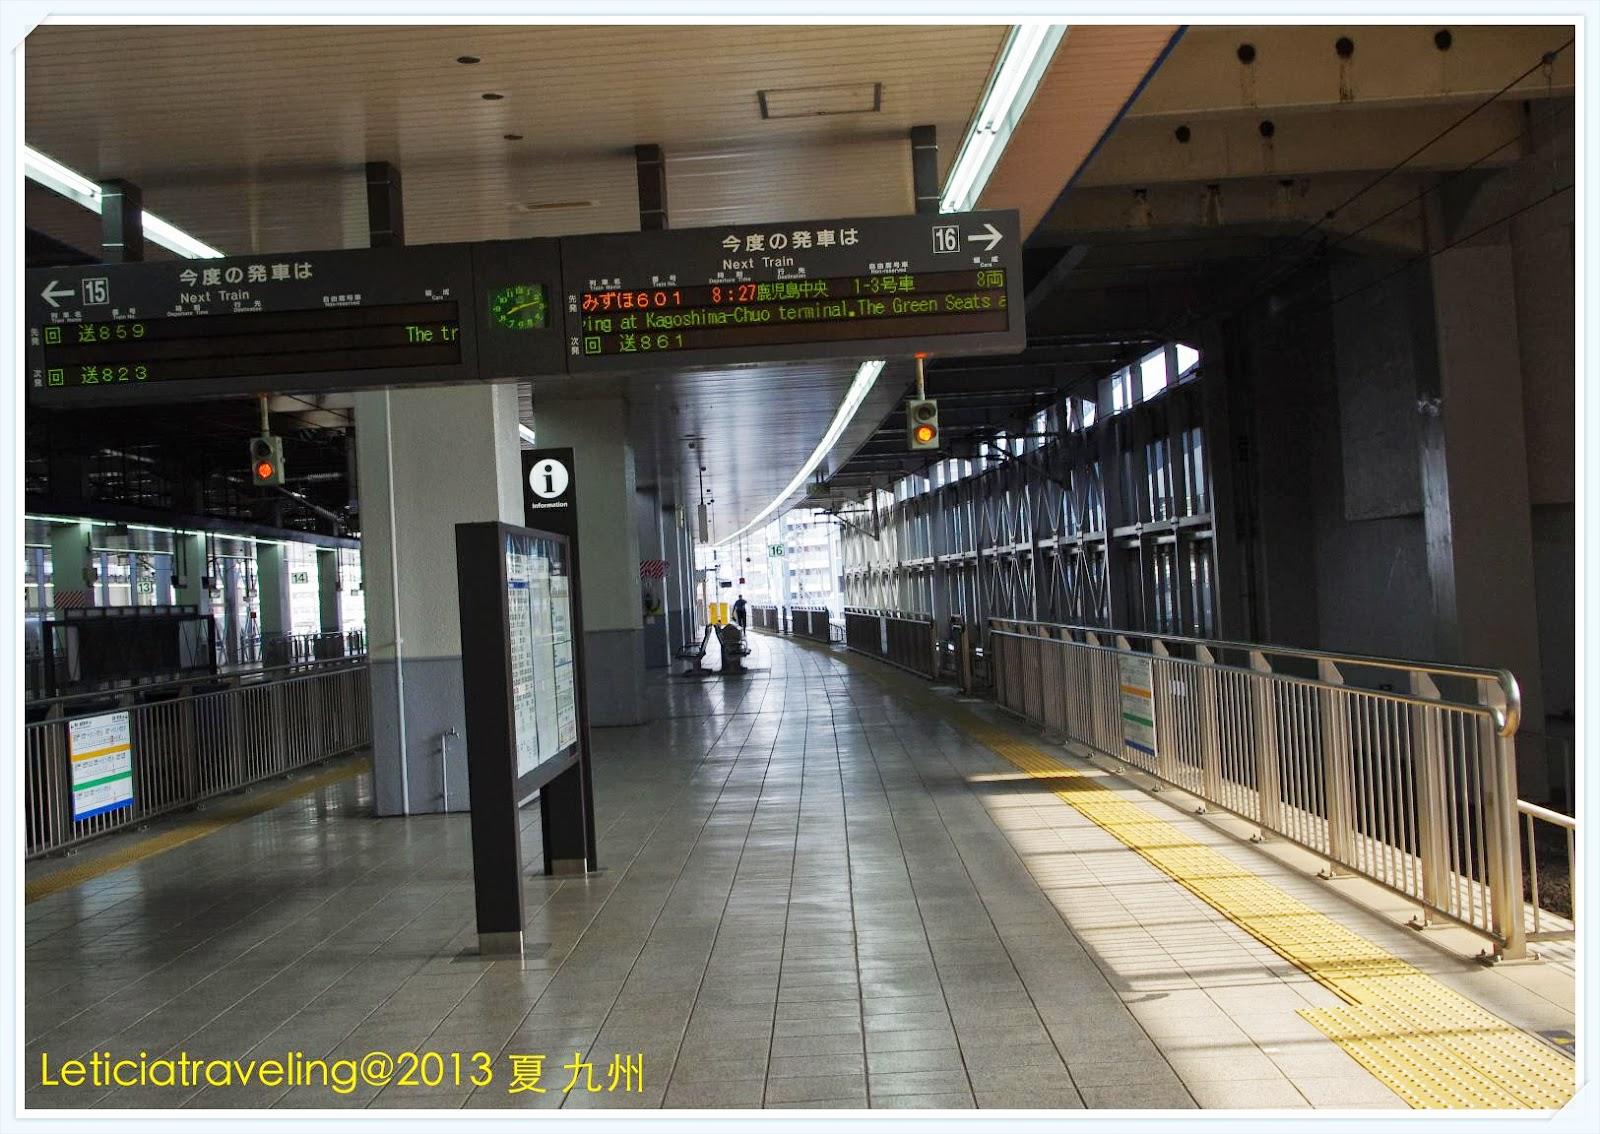 Leticia旅遊全記錄!!: 2013 久違的Family trip 九州Day 2-1 鹿兒島之仙巖園